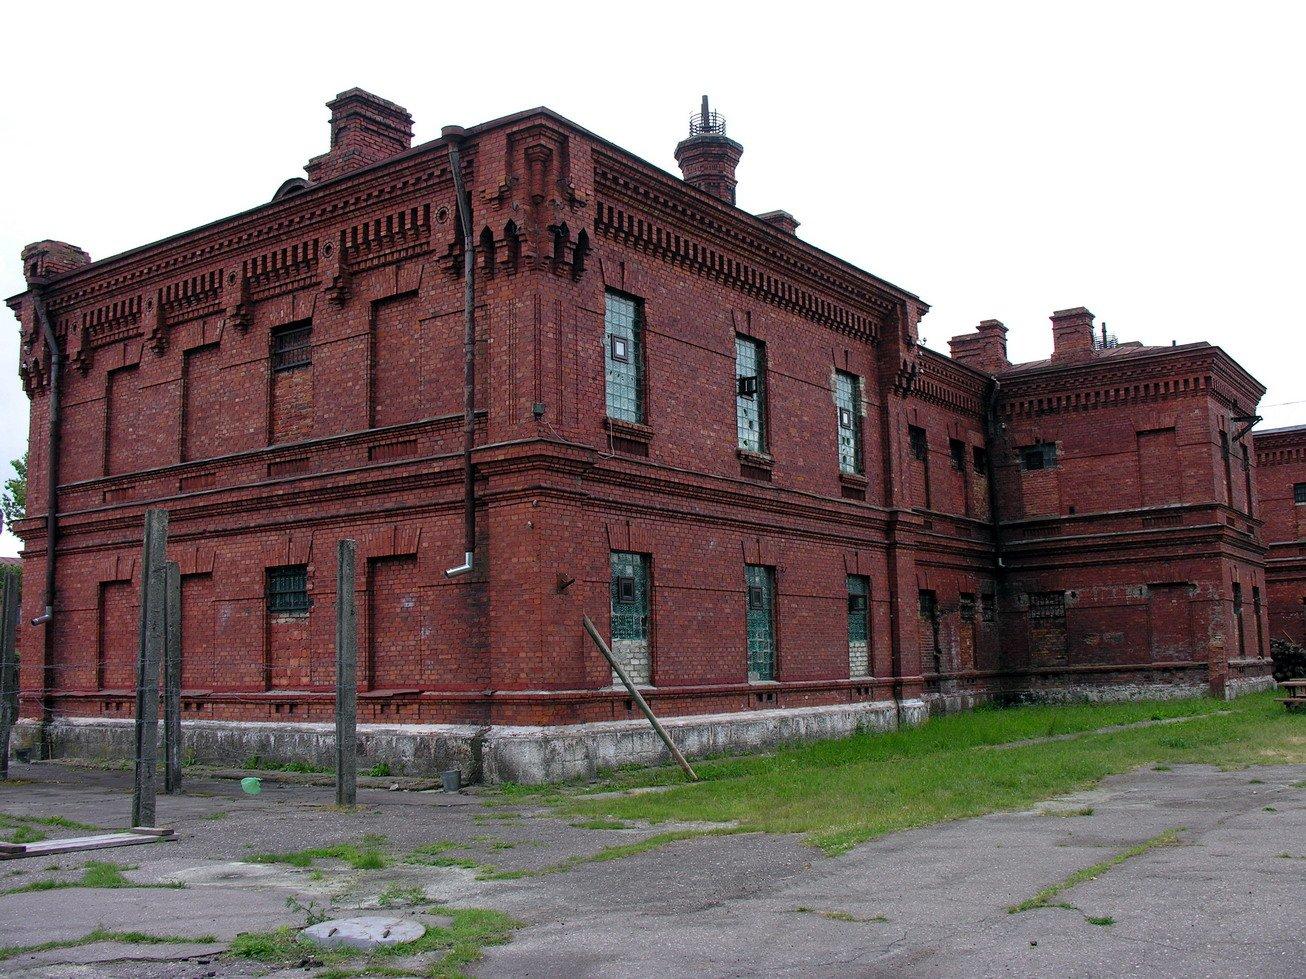 Karosta Prison - Lettland